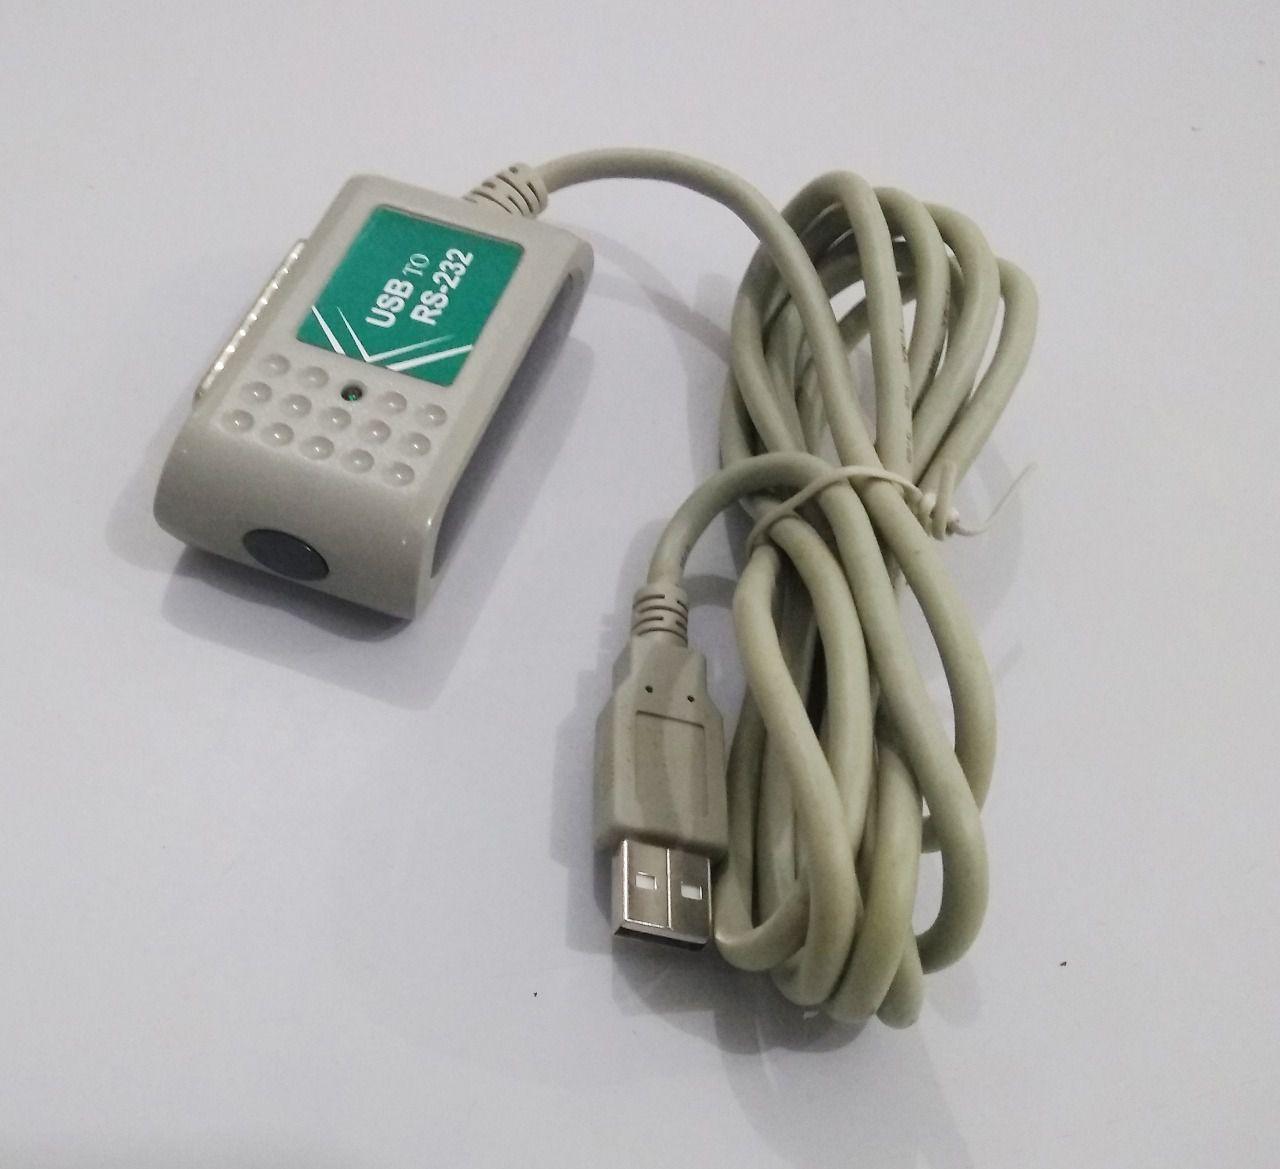 UTS1025 - ADAPTADOR USB PARA RS-232